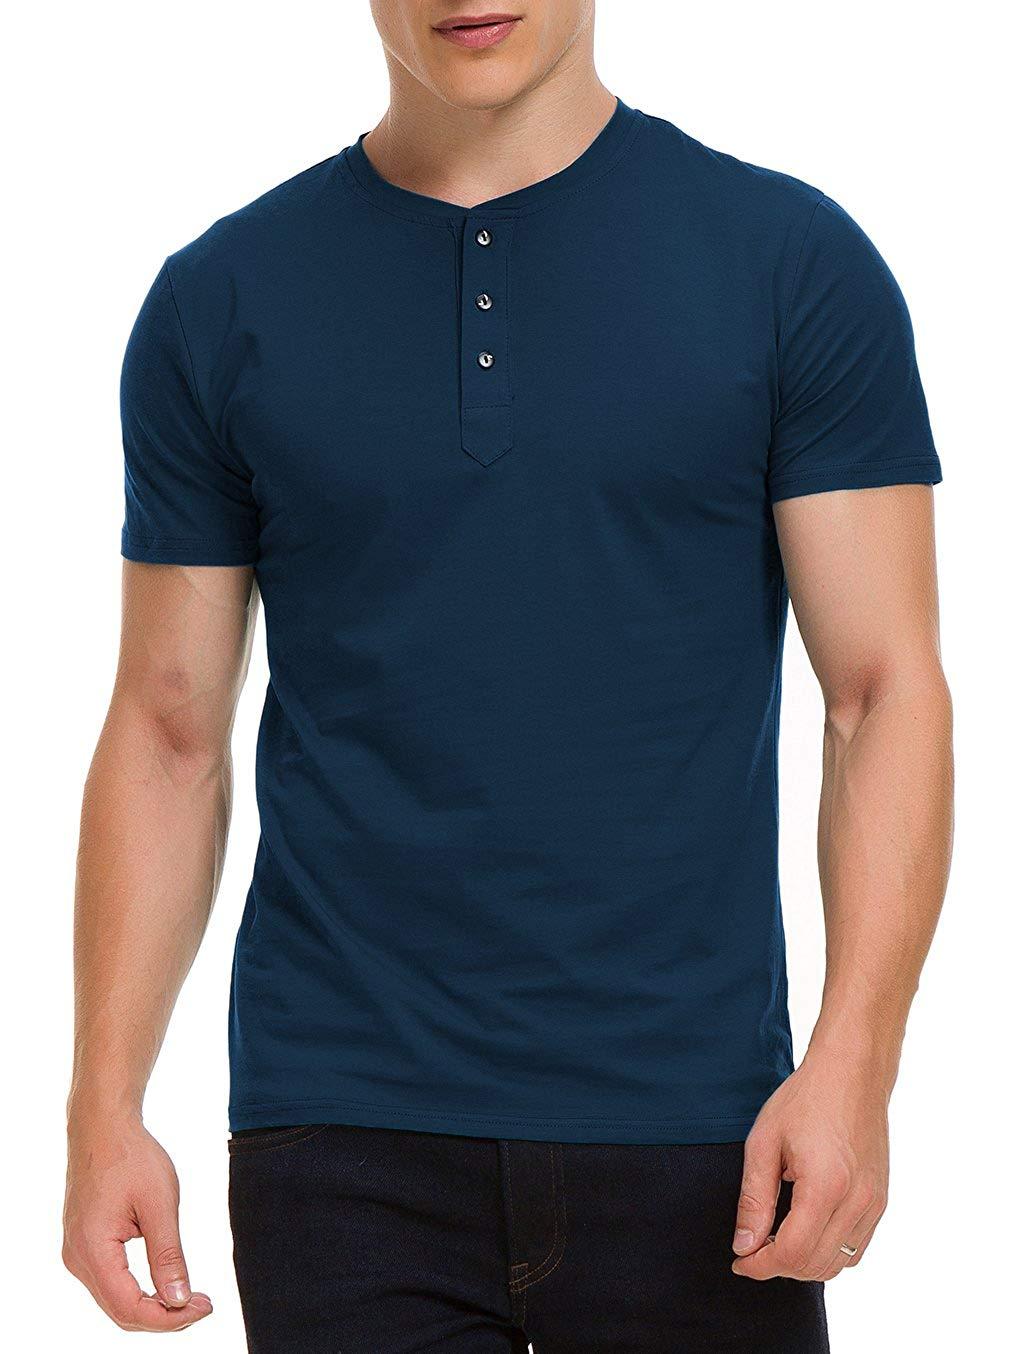 Men's Casual Slim Fit Short Sleeve Henley T-Shirts Cotton Shirts Beach Style  Cotton  Cotton